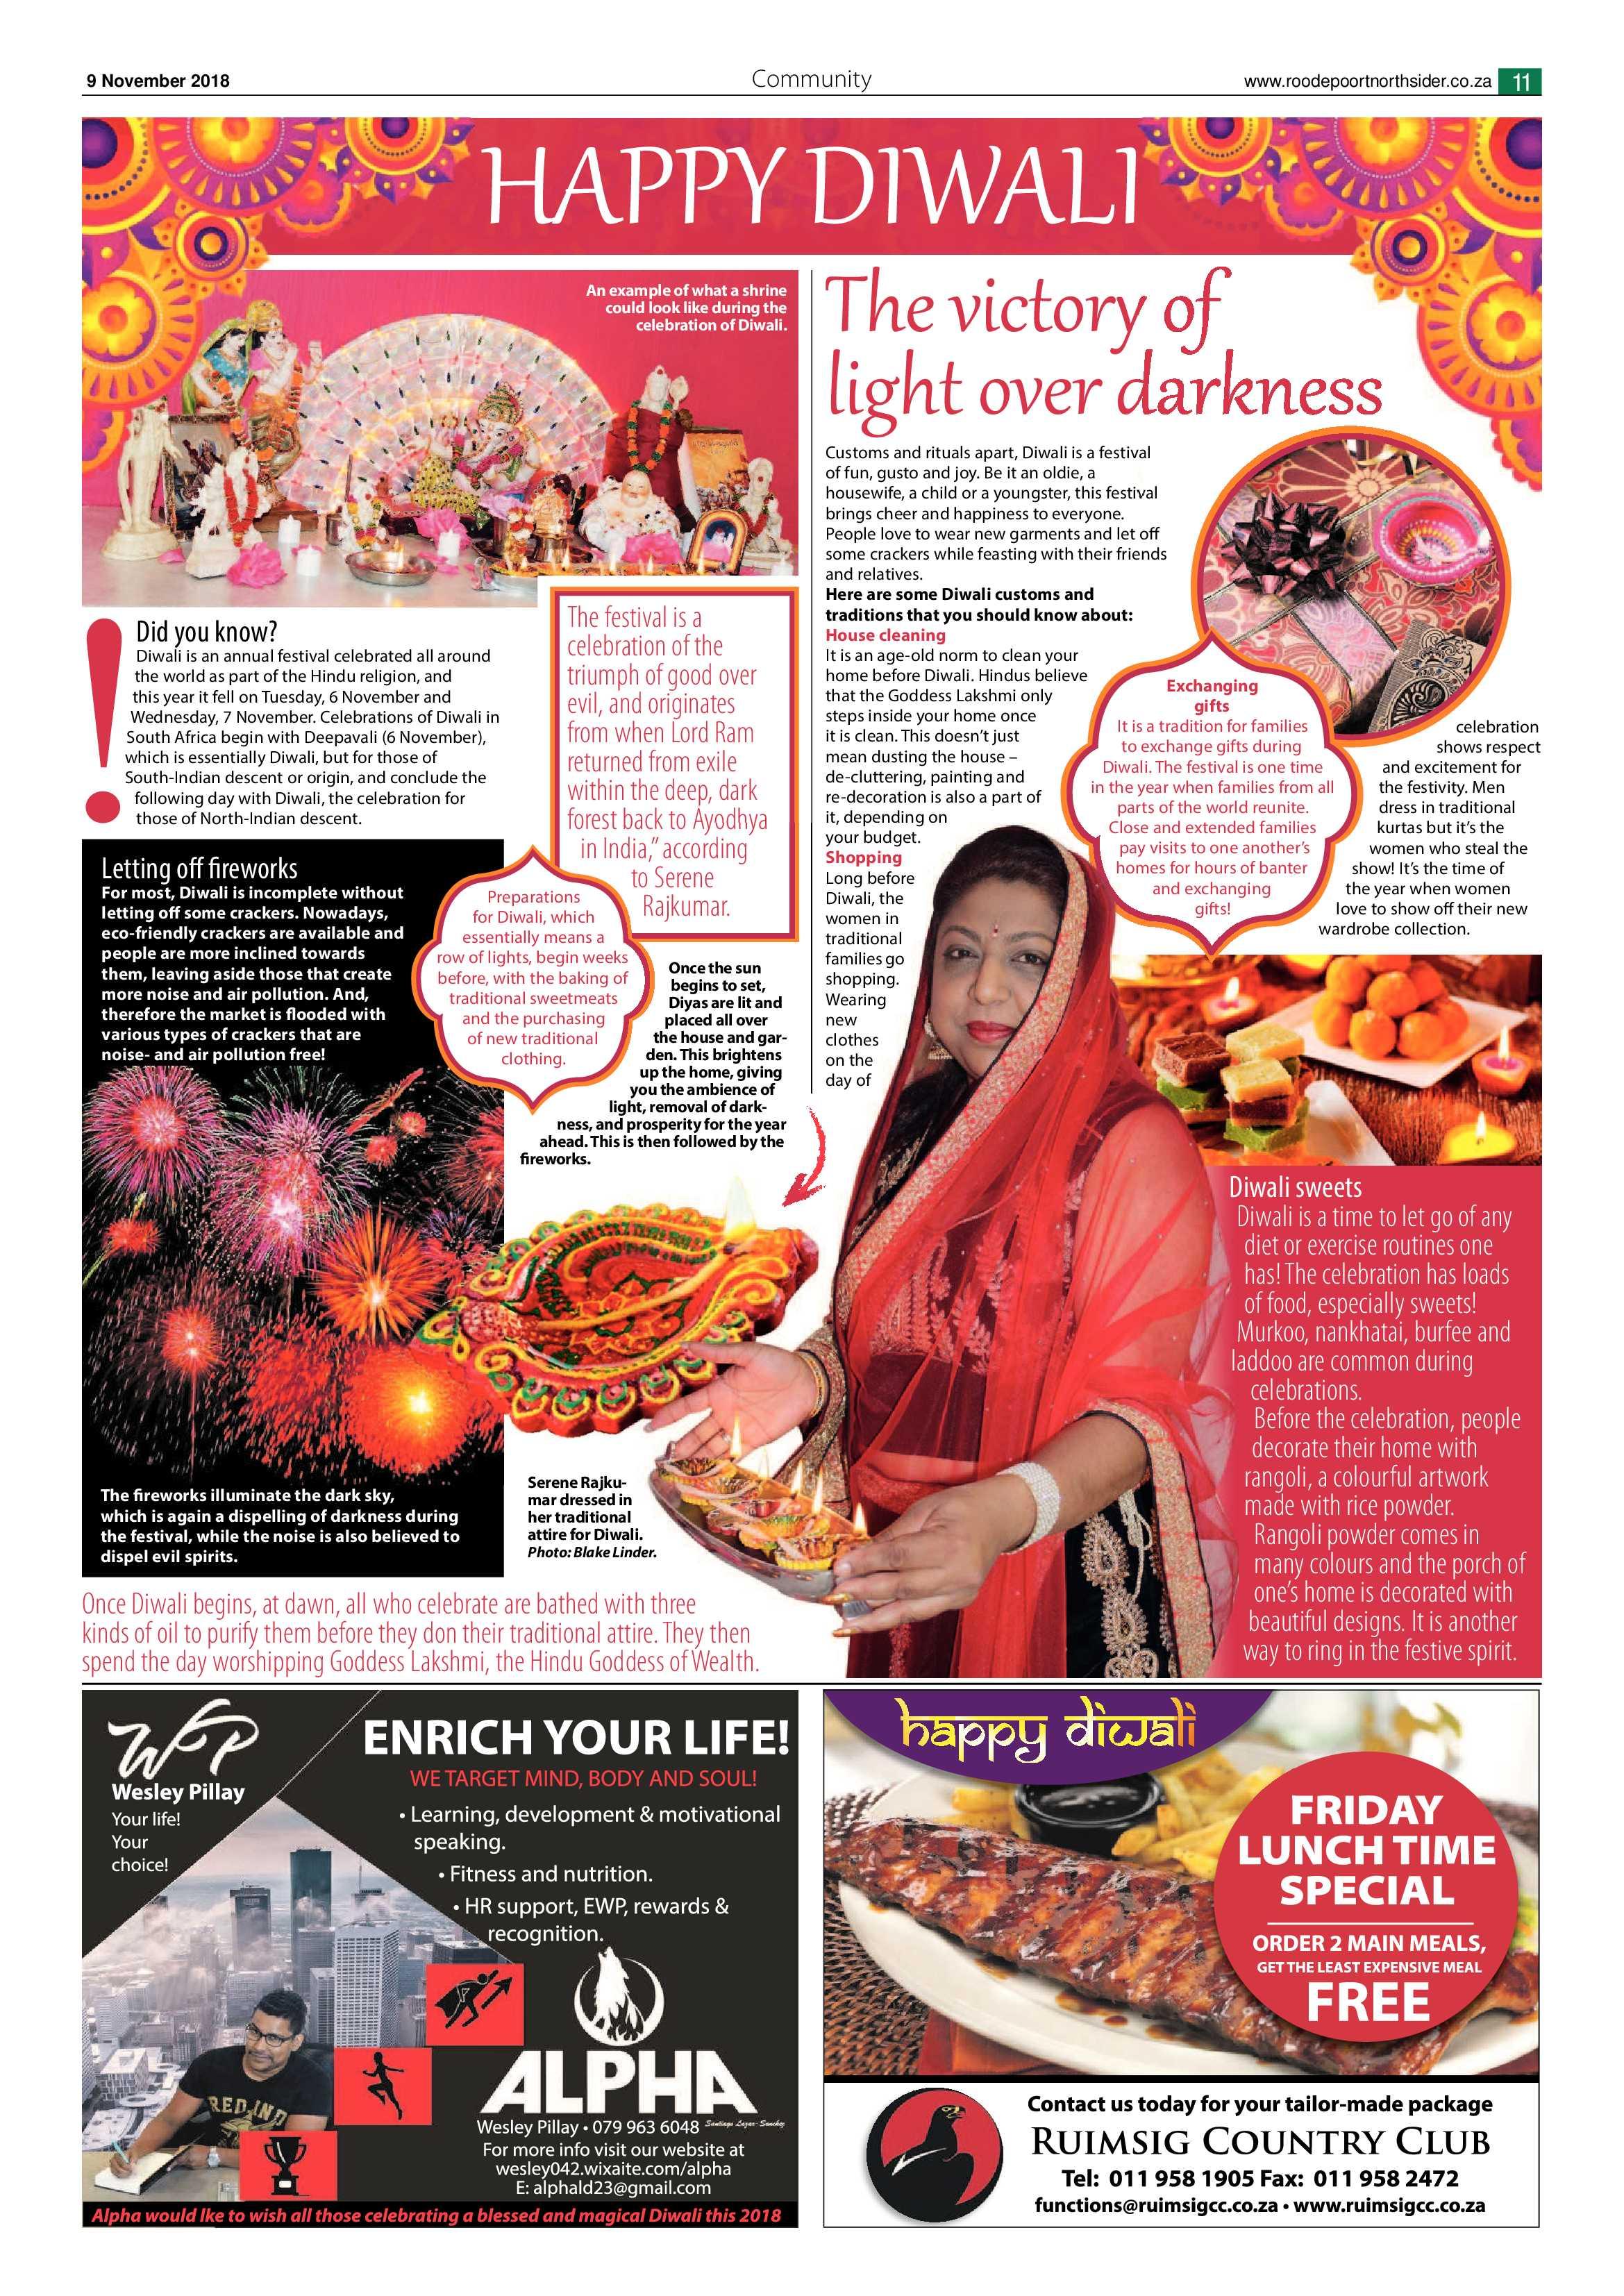 roodepoort-northsider-9-november-2018-epapers-page-11